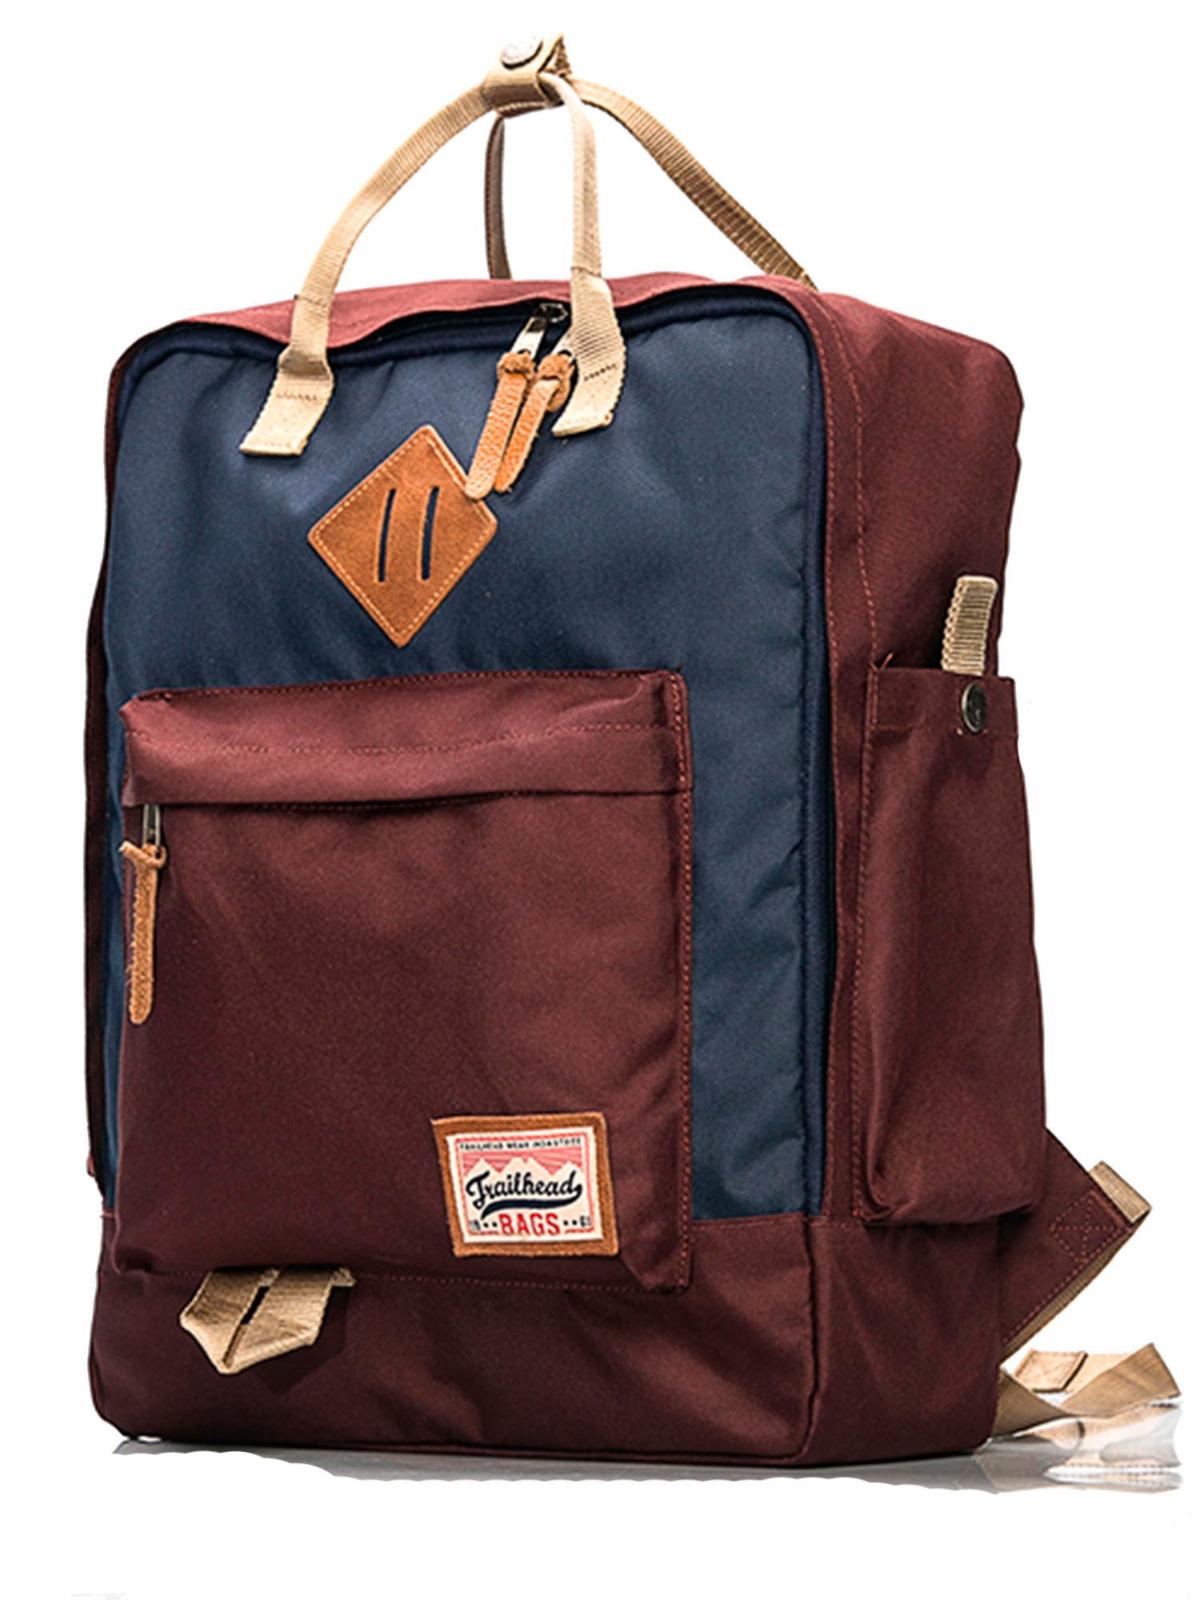 Рюкзак мужской Trailhead, цвет: бордовый, синий. BAG0003-15-1_MAROON/NV рюкзак мужской quiksilver everydaypostemb m eqybp03501 bng0 королевский синий